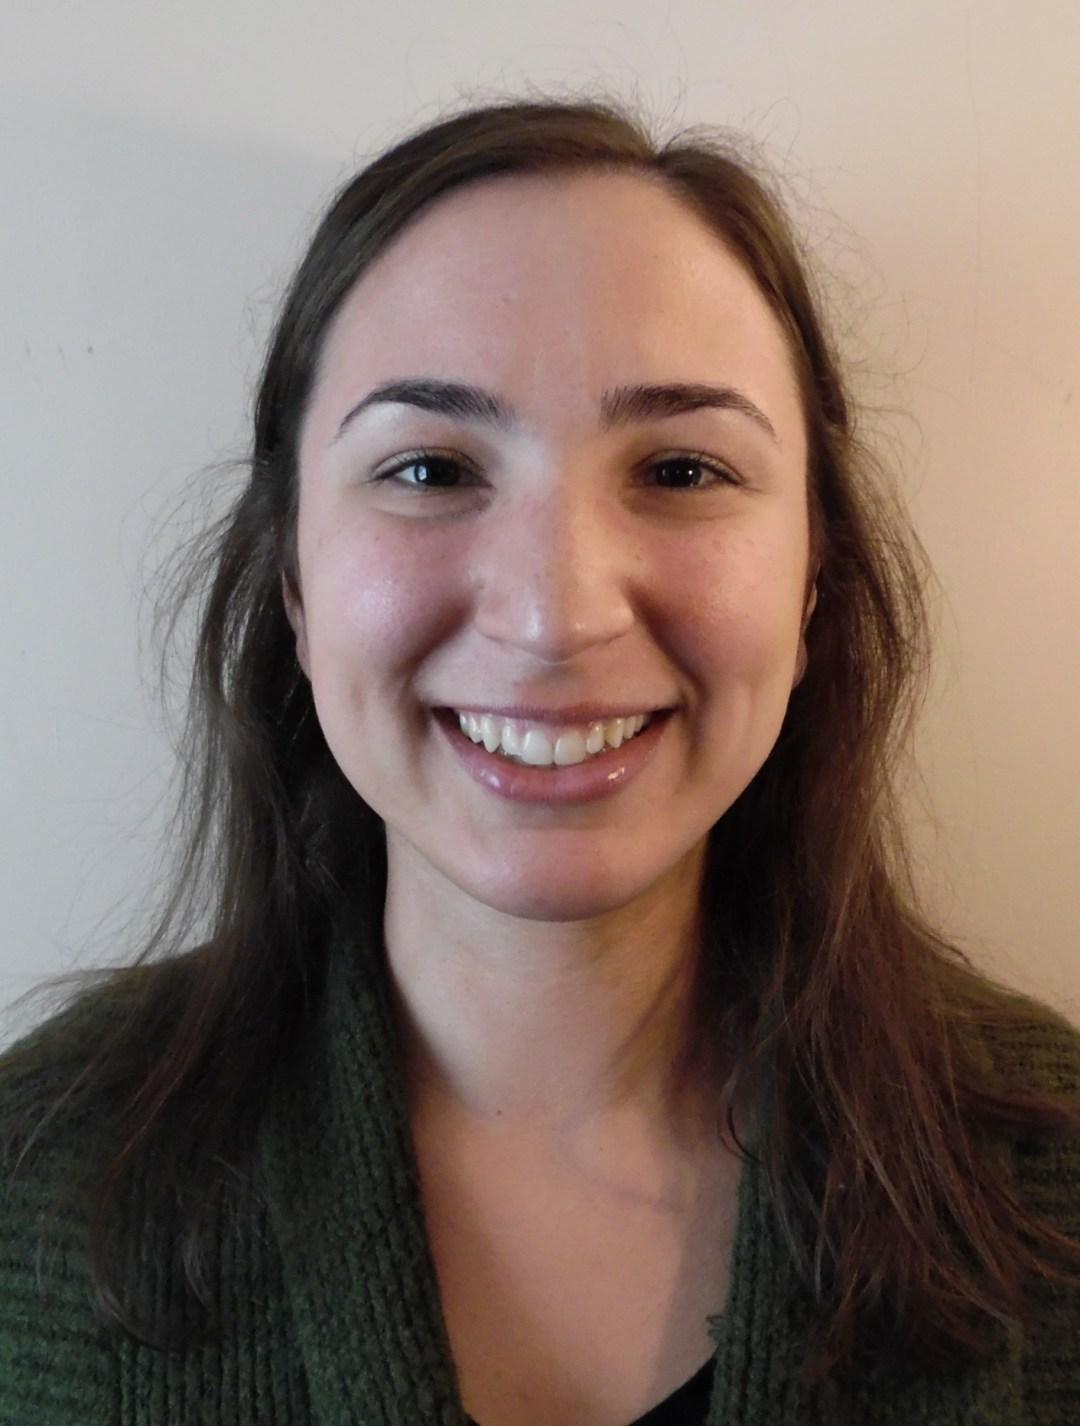 Rachel Lazarus, Licensed Massage Therapist at Simsbury Therapeutic Massage & Wellness